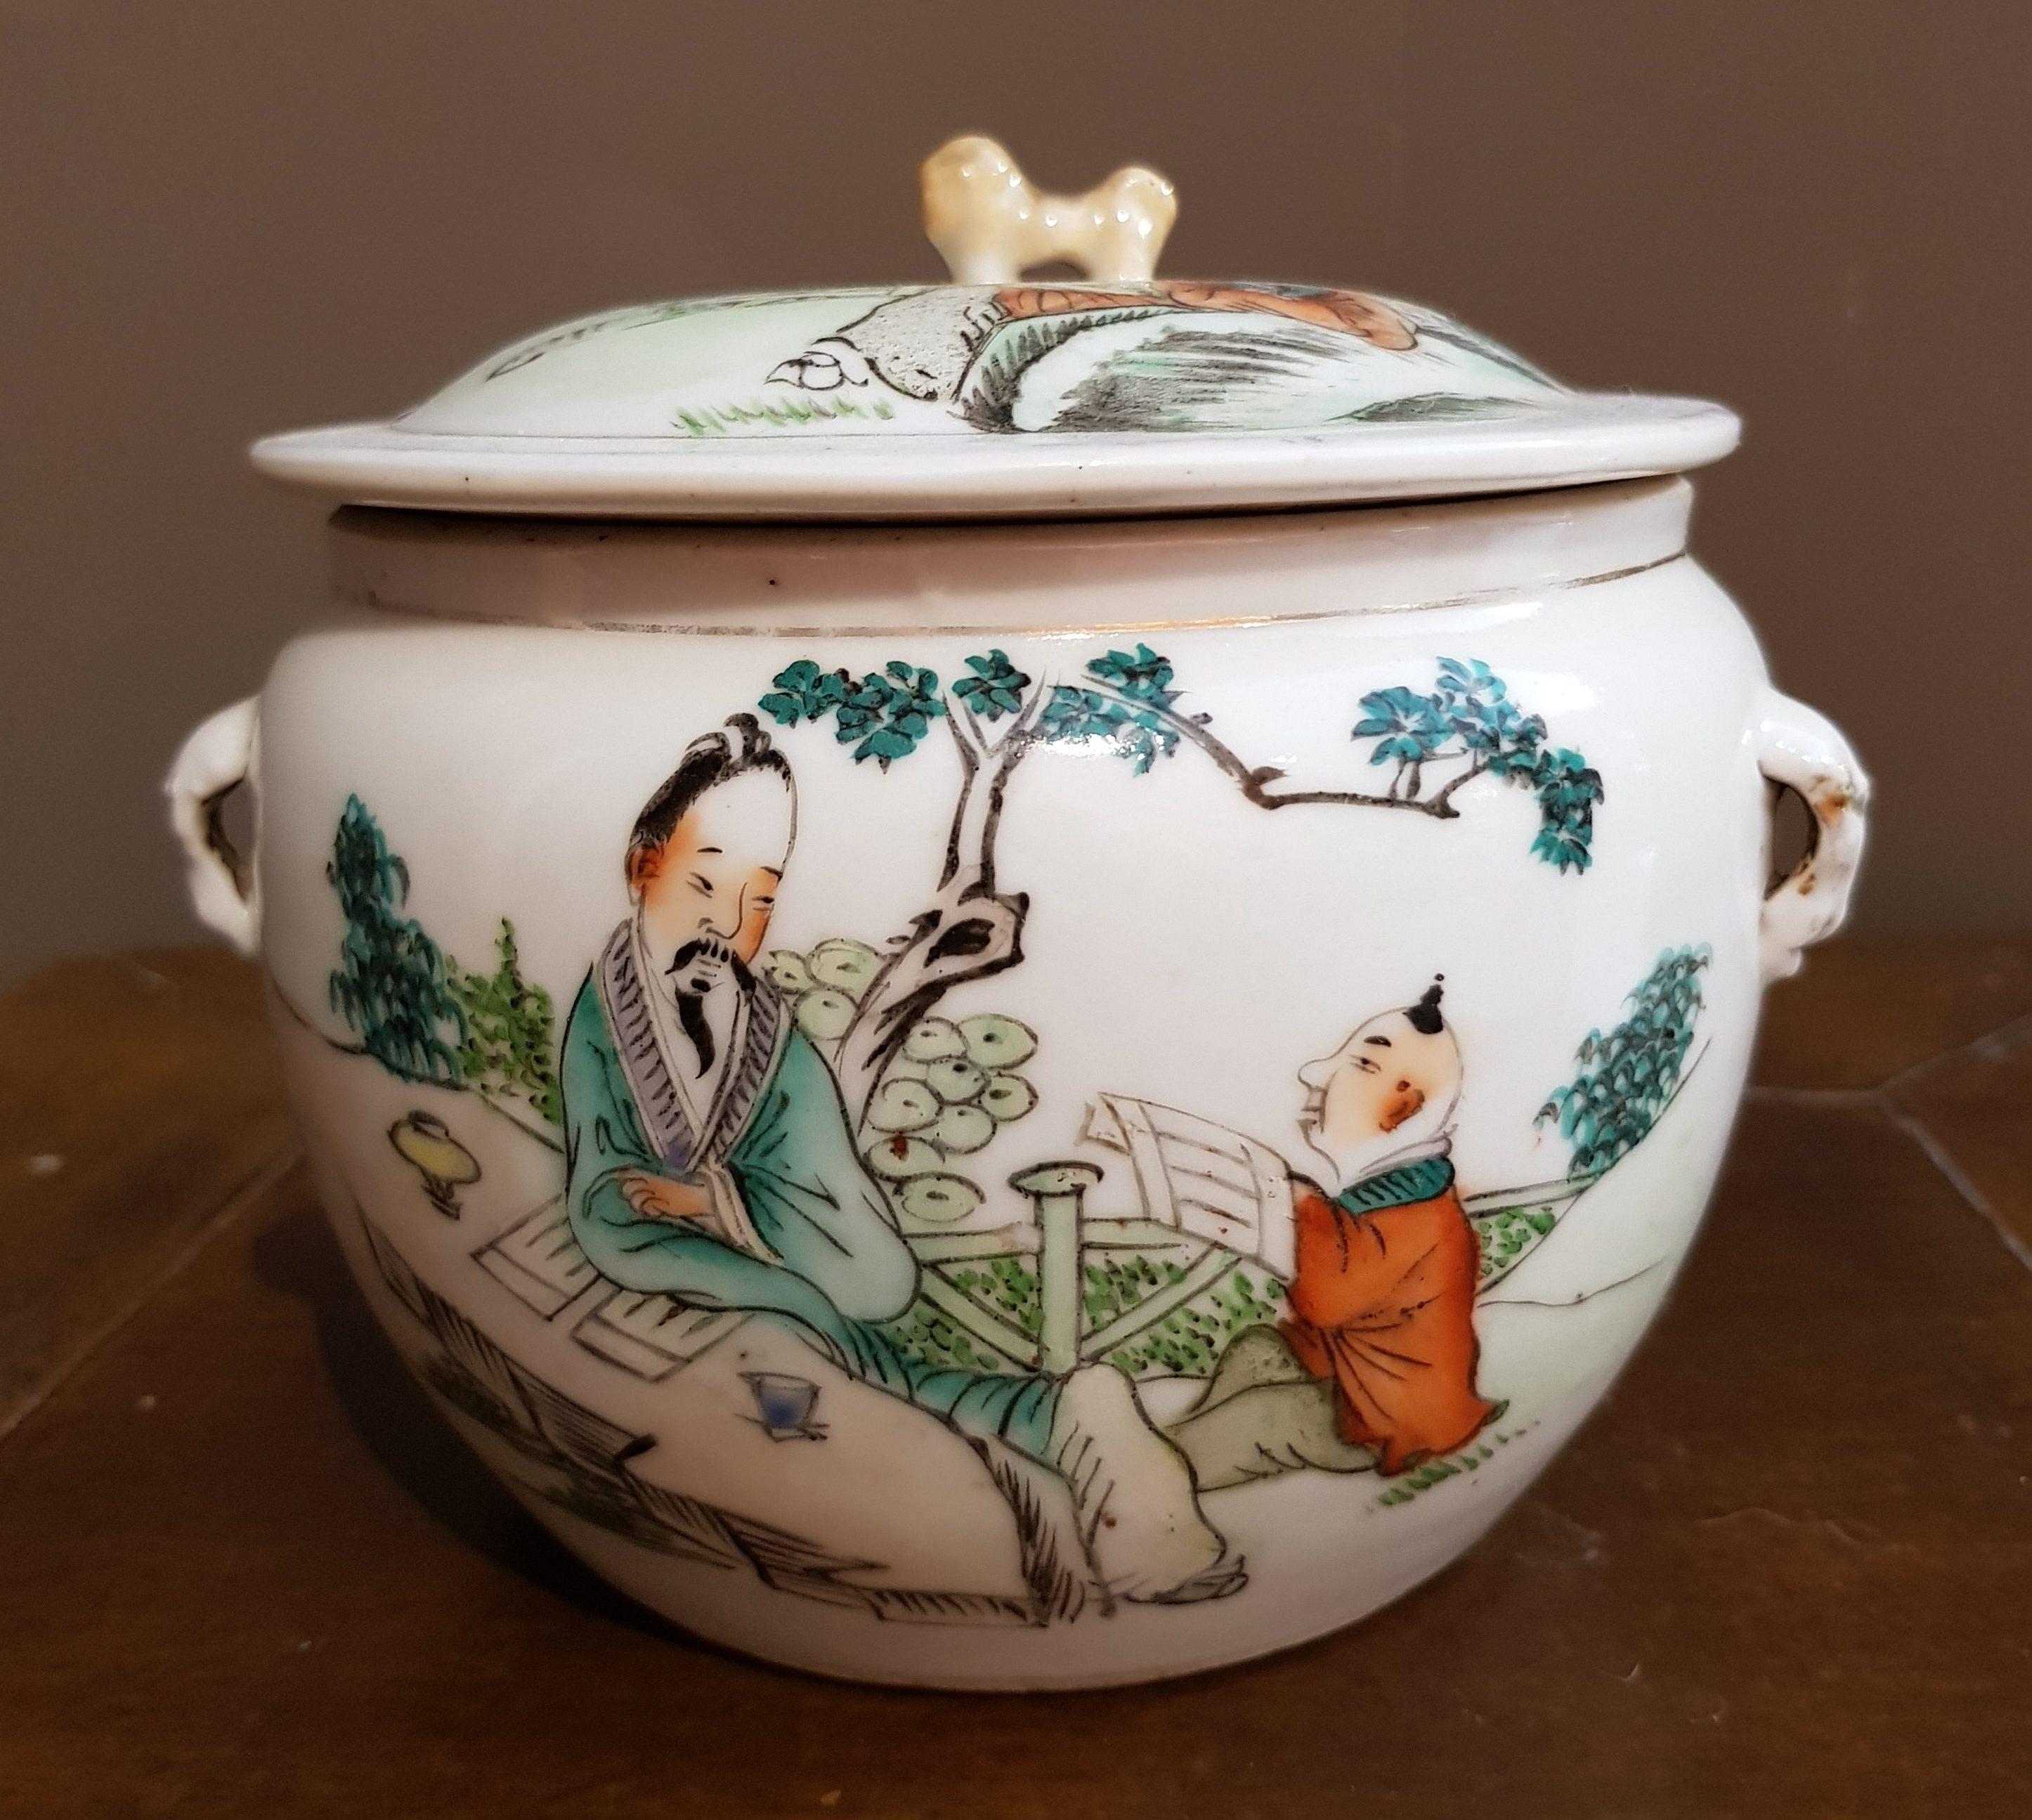 Pot couvert en Porcelaine de Chine - Famille Rose - Wu Shuang Pu Image